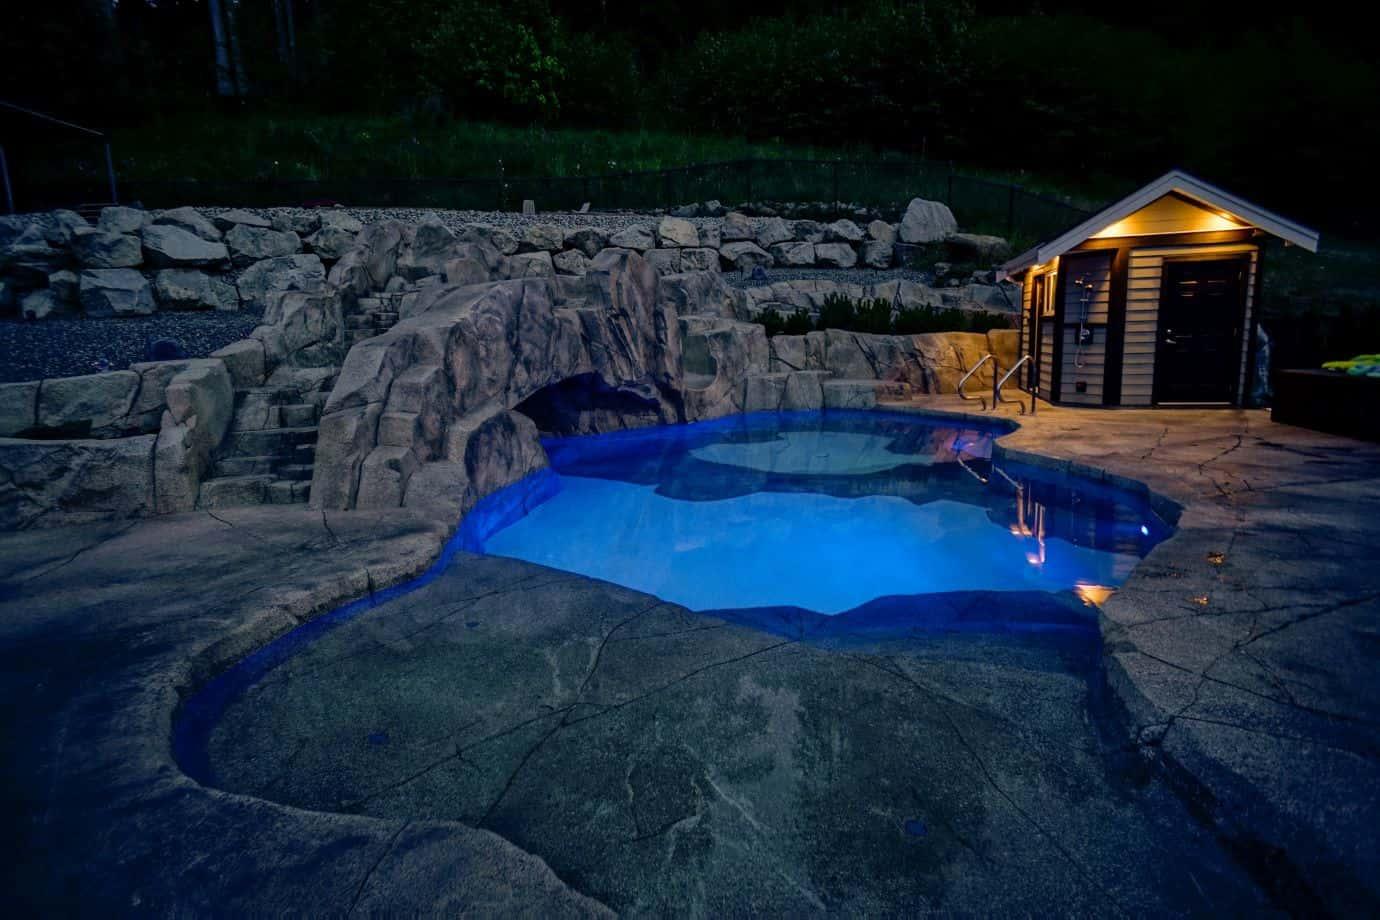 azuro-swimming-pool-cabana-Carm13